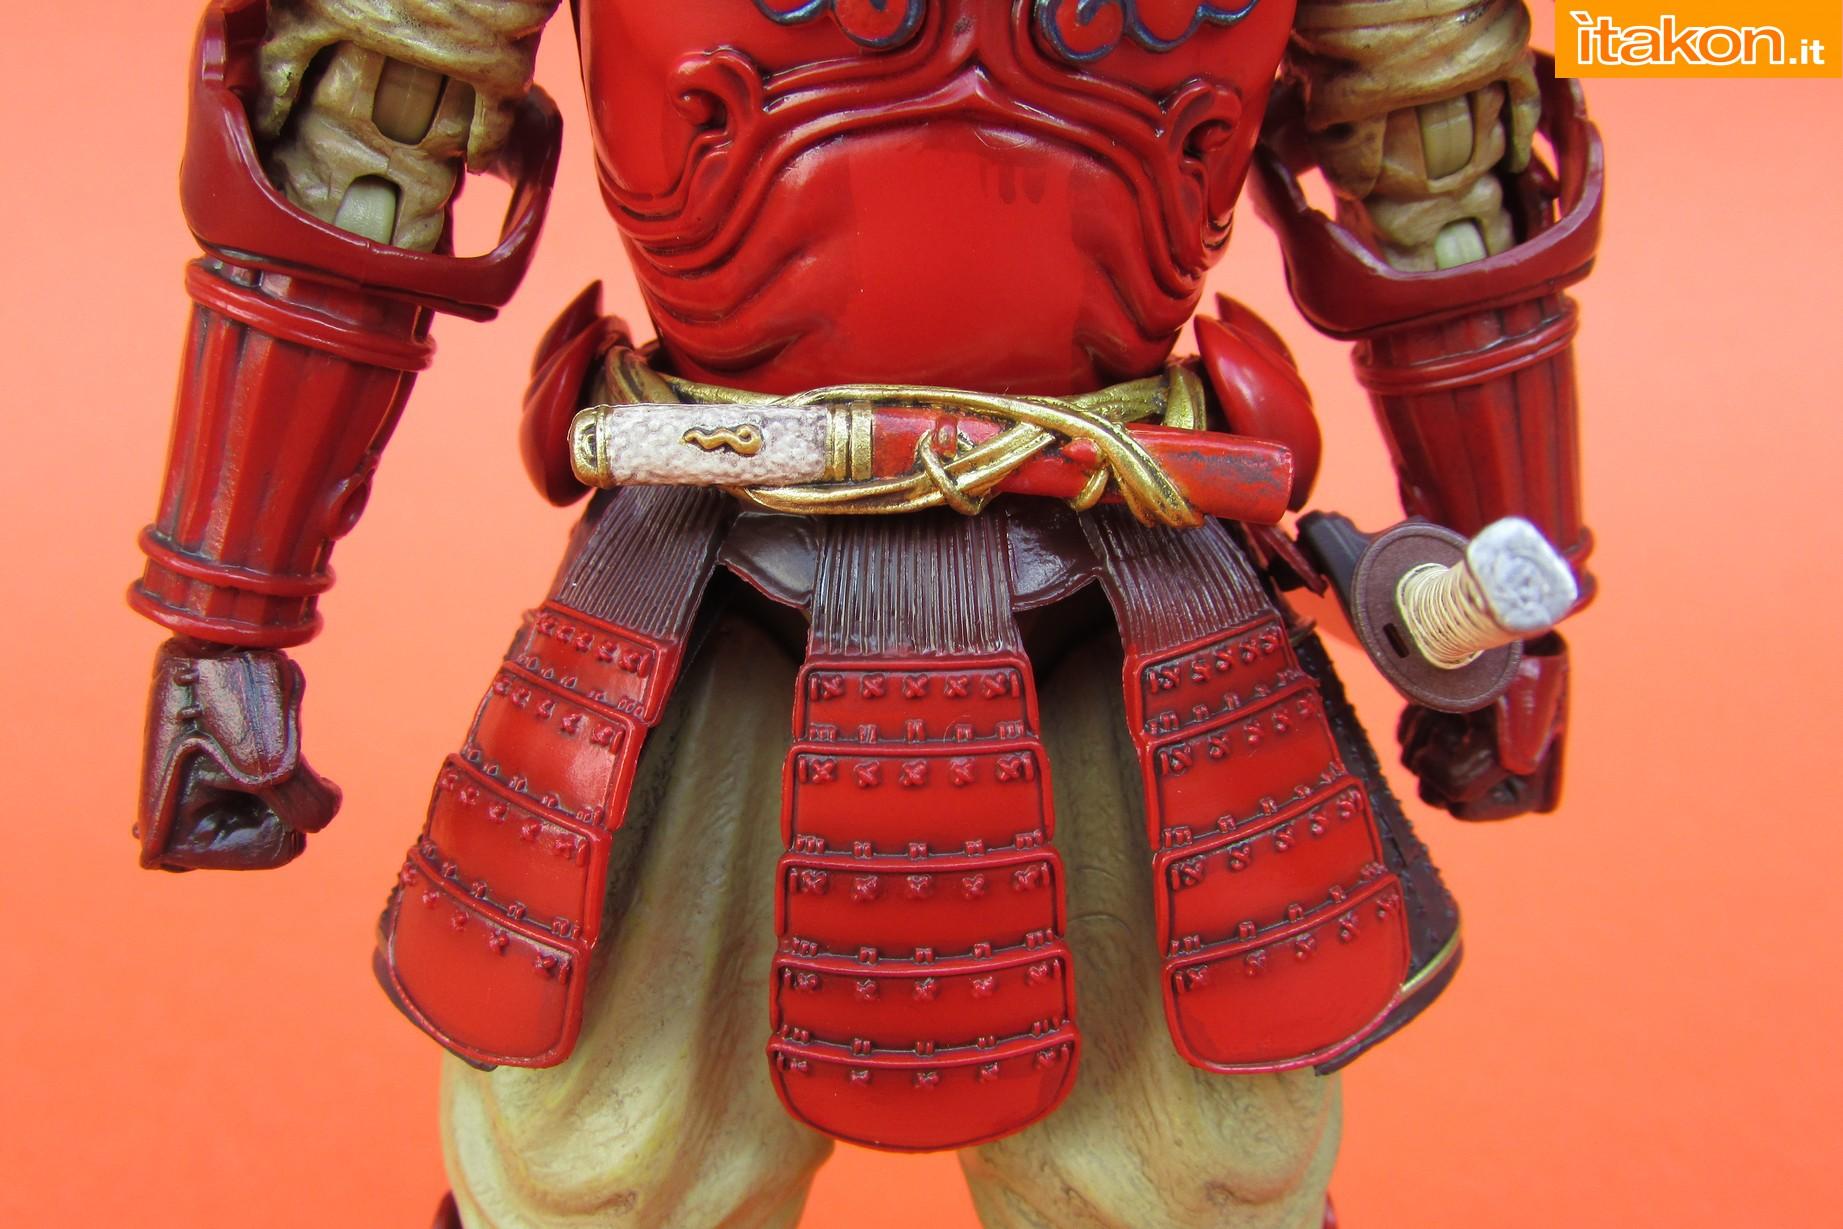 Link a Marvel Comics Koutetsu Samurai Iron Man Mark 3 Meishou MANGA REALIZATION review Bandai Itakon.it17